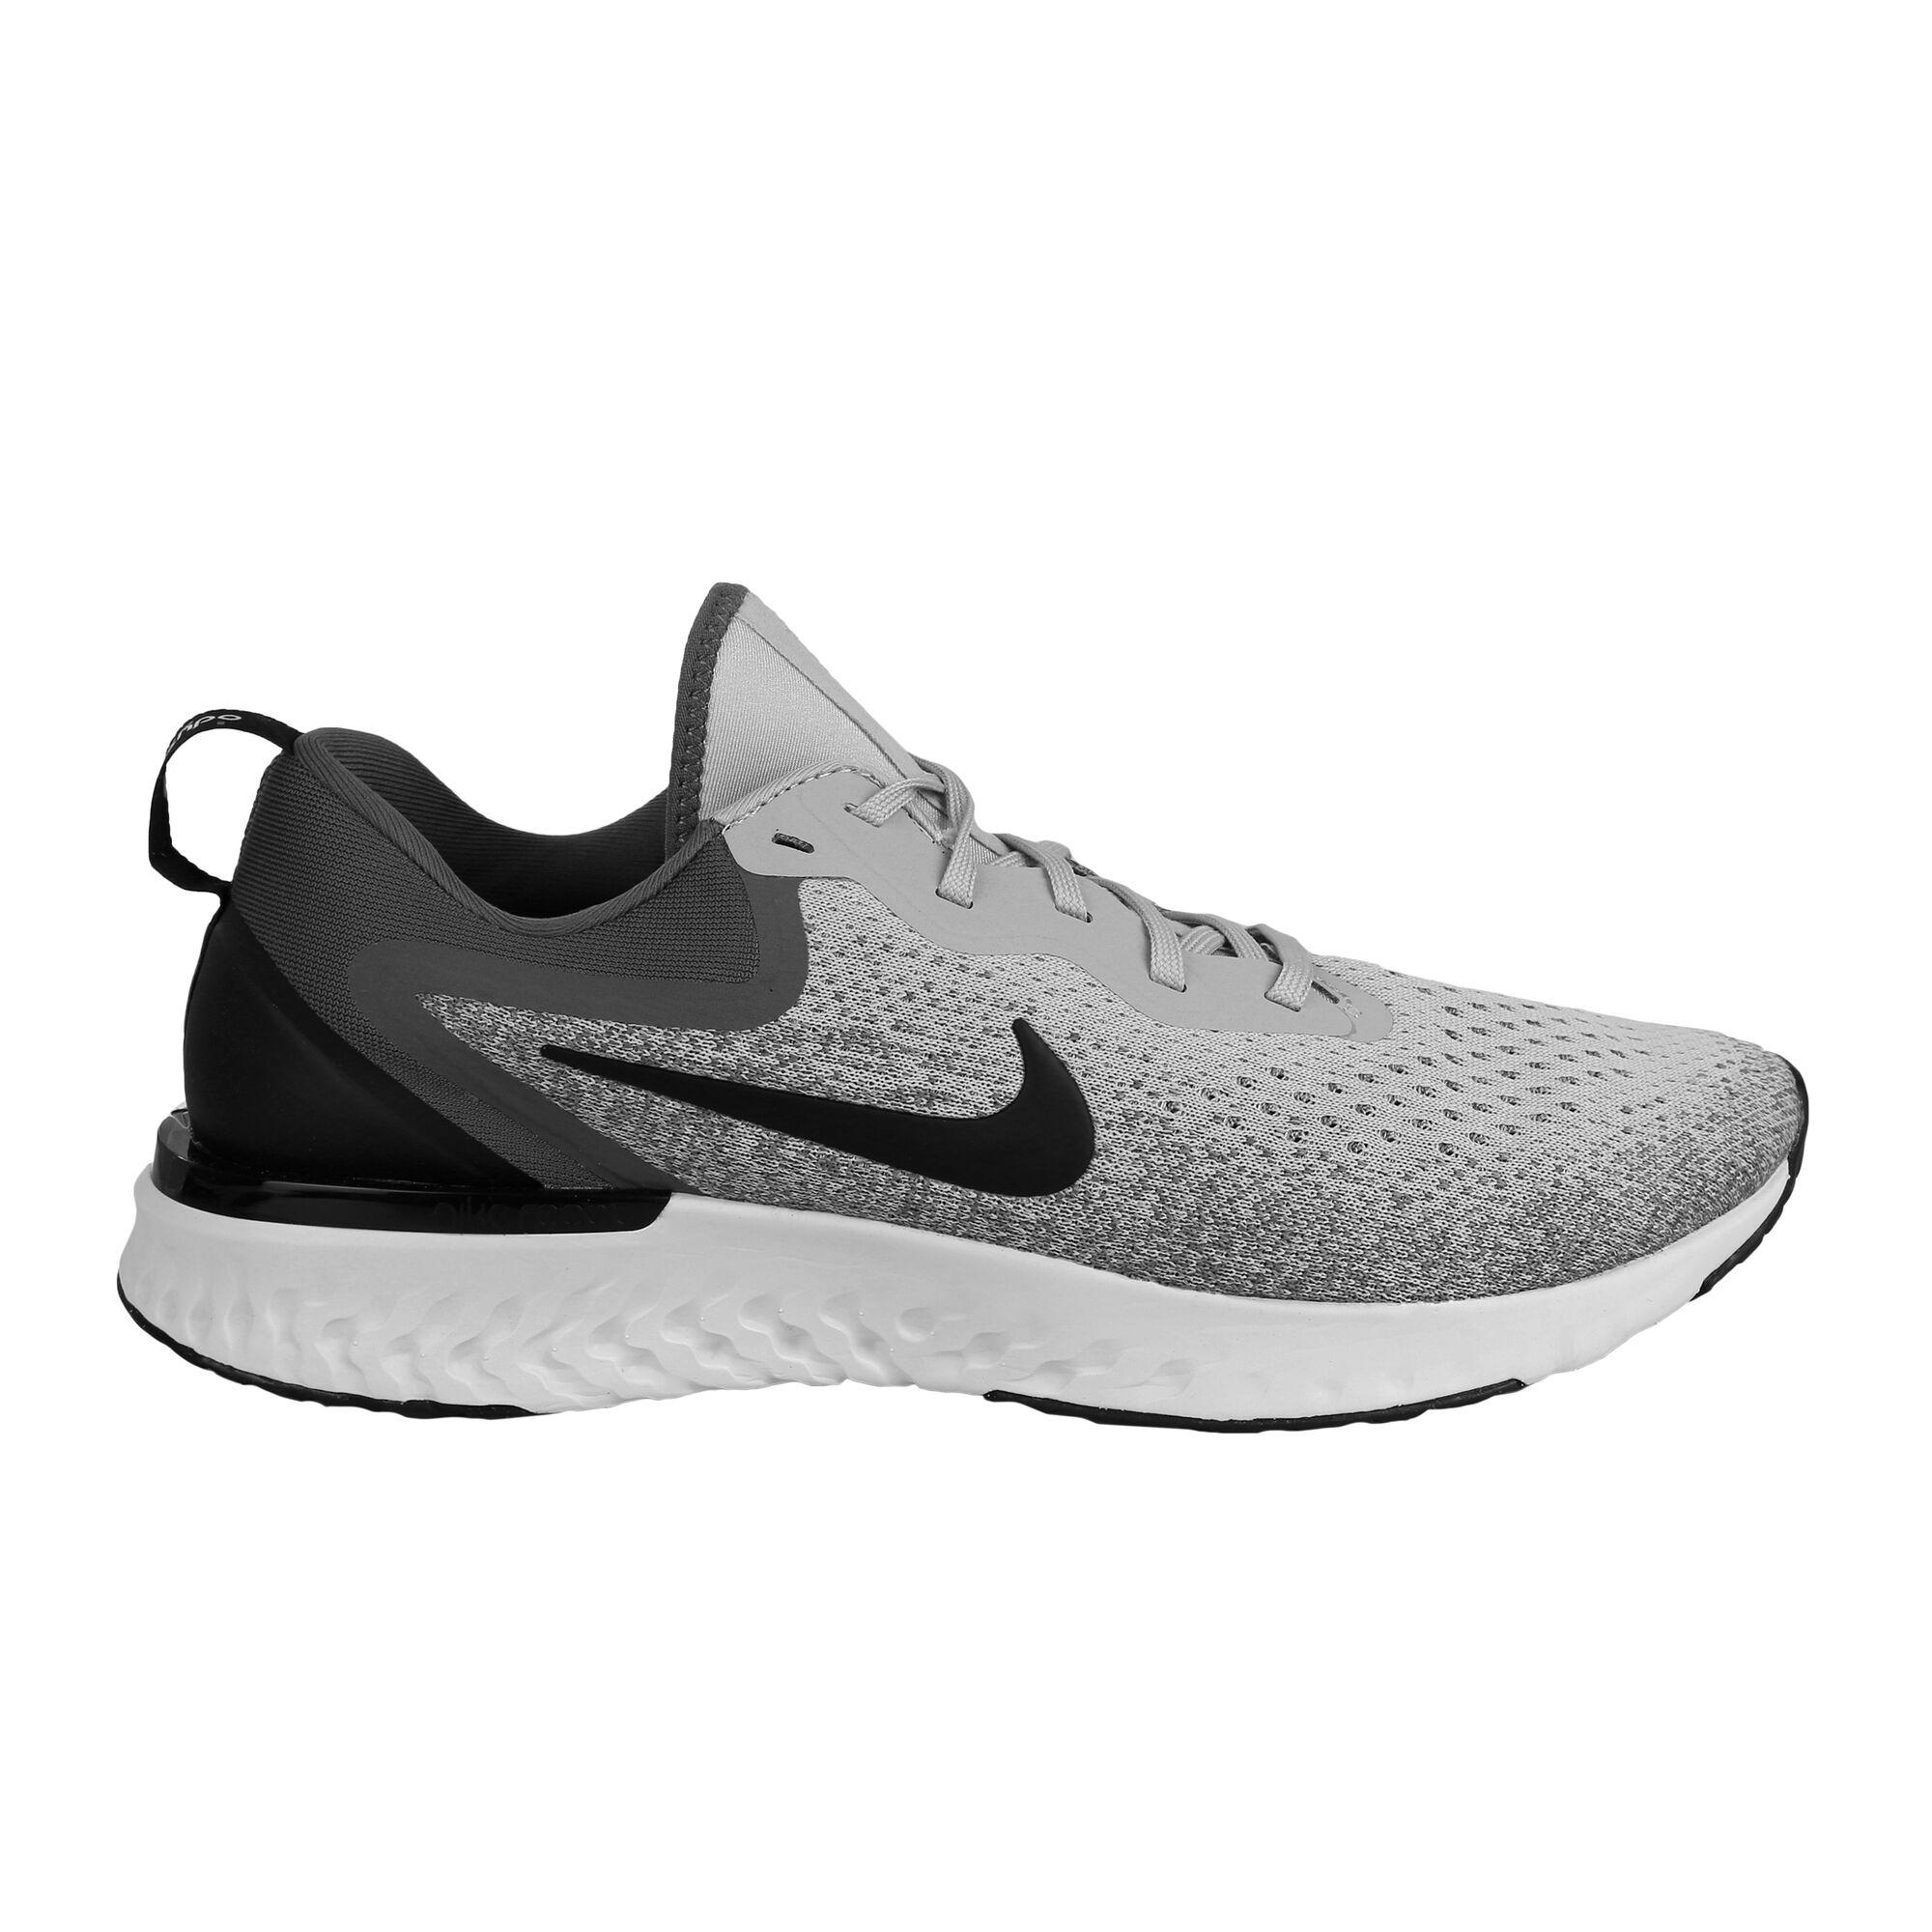 new concept ca38d 75155 Nike Glide React Neutralschuh Herren - Grau, Dunkelgrau online ...